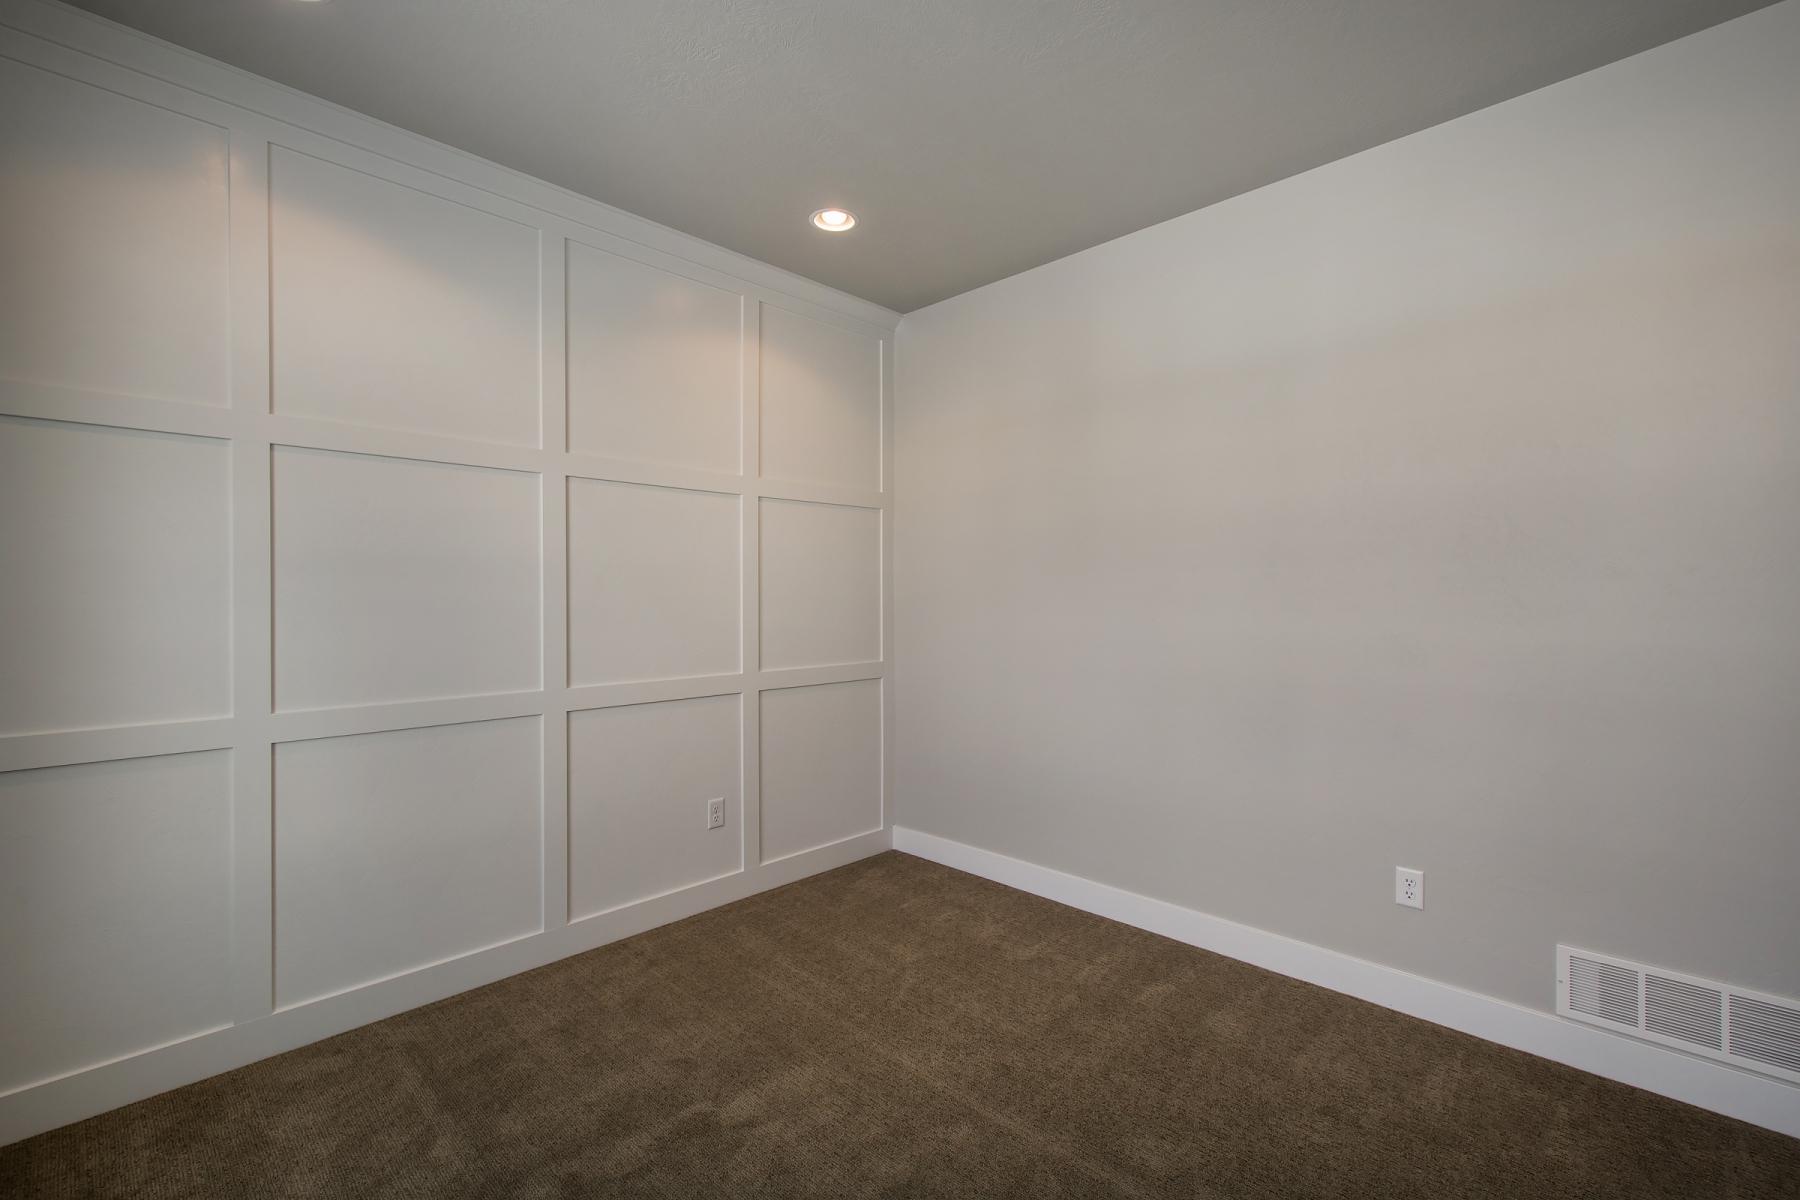 livingroom_1800x1200_2566069